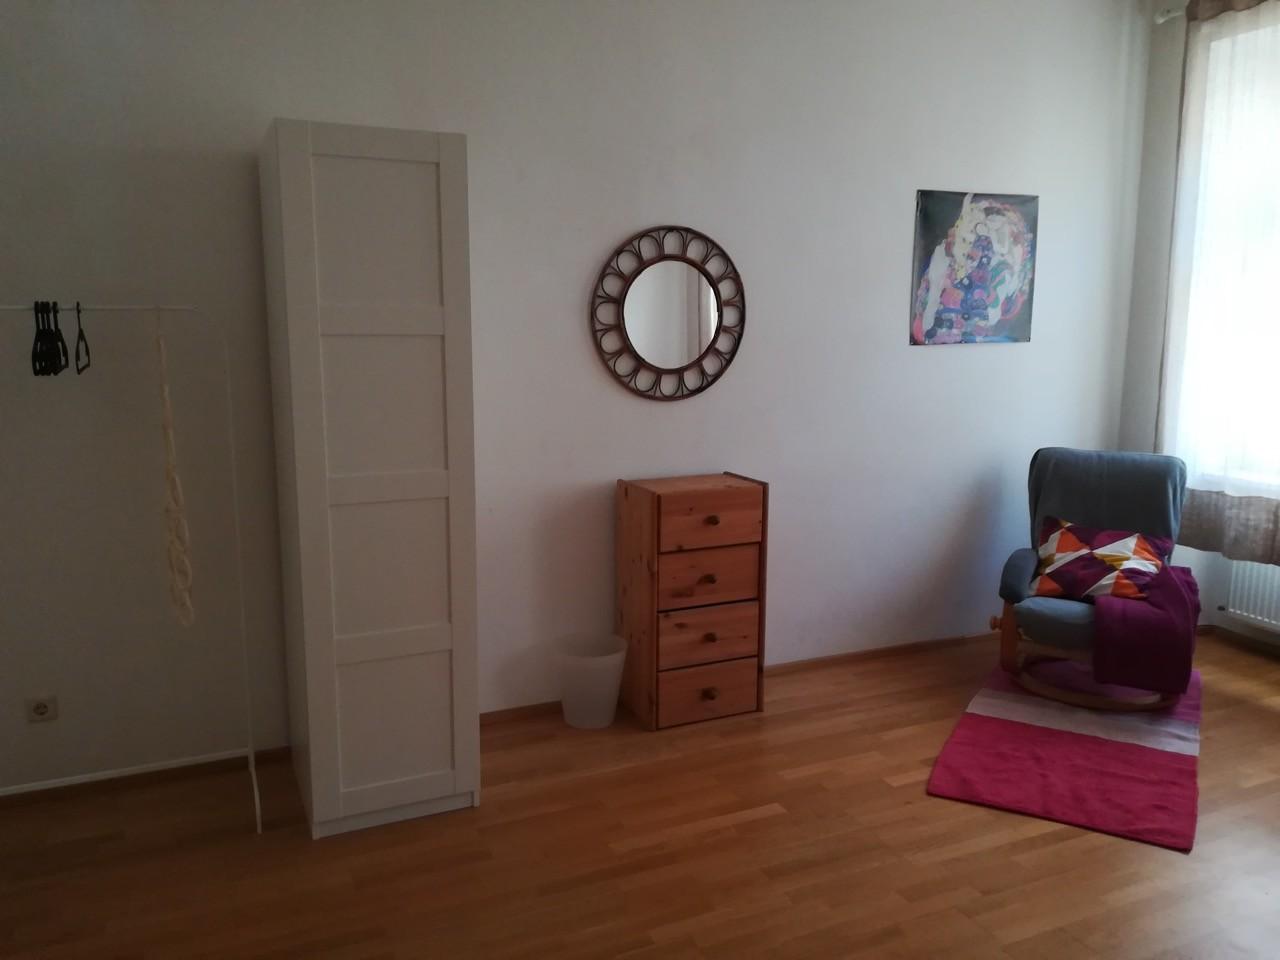 furnished-25-qm-room-e-500-all-inclusive-near-central-station-92a68f83eab5c063f2cbb52f2ec15b61